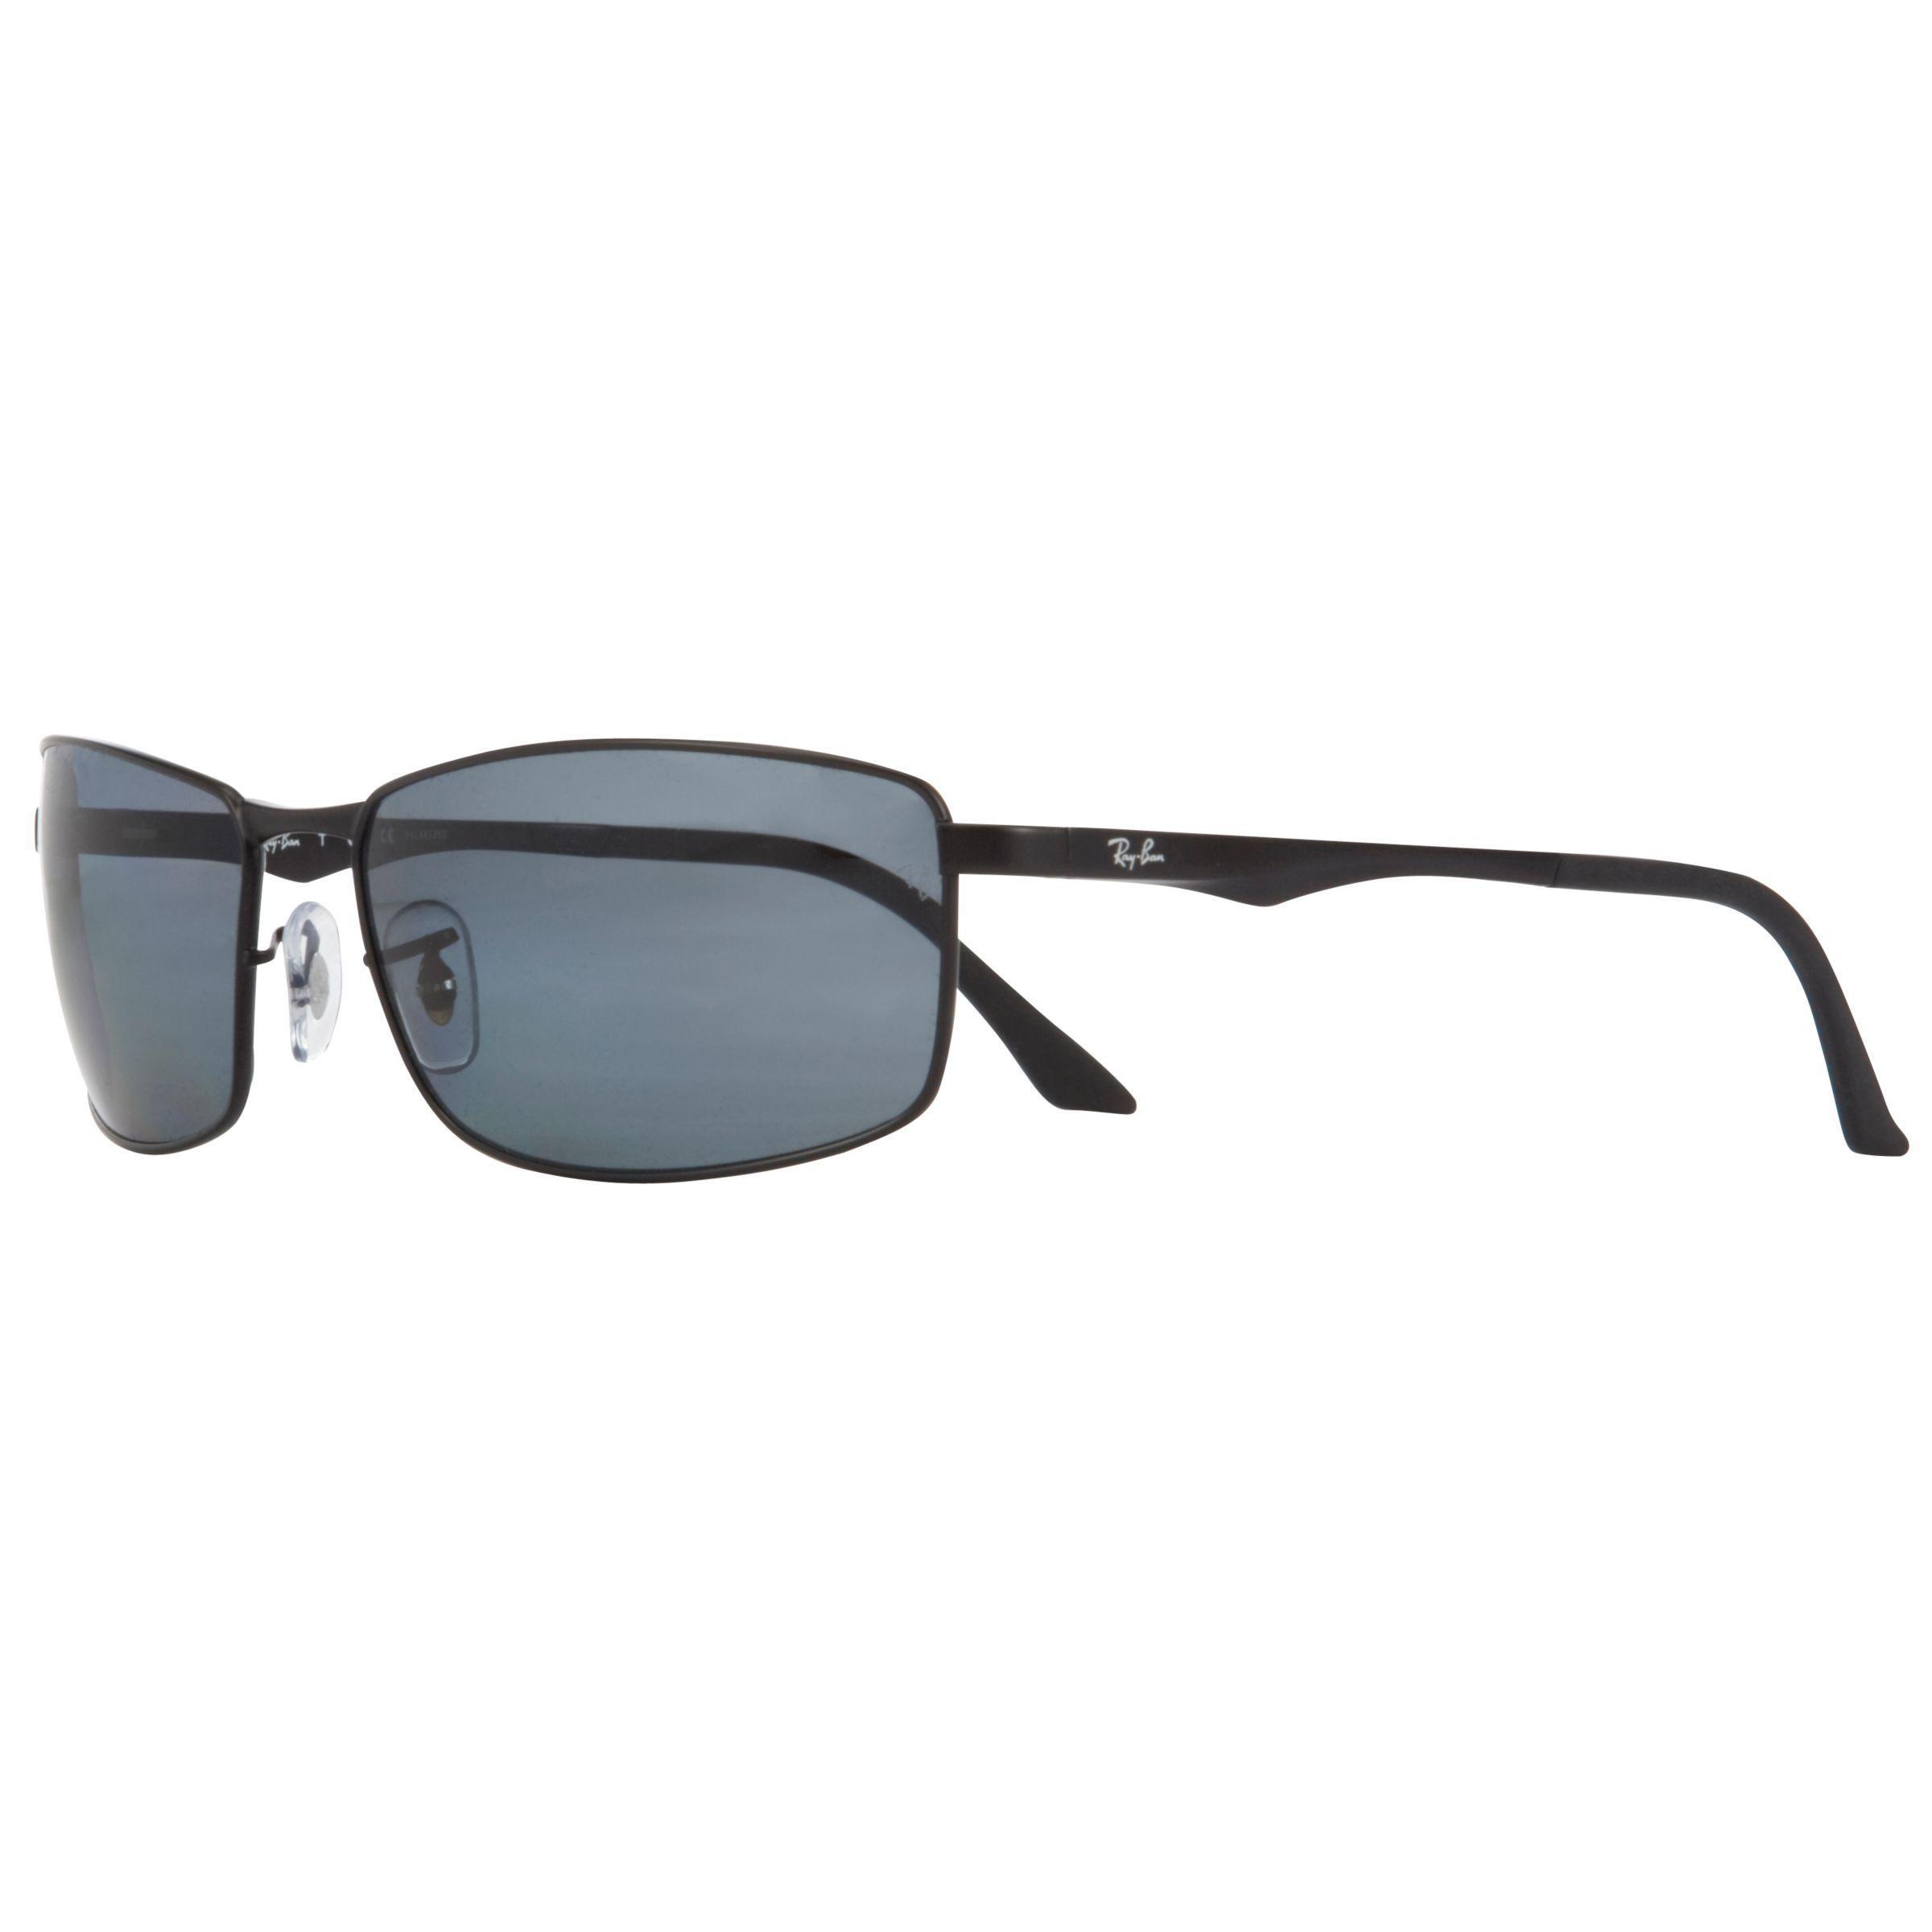 7826df6206 Ray-Ban Rb3498 Rectangular Polarised Sunglasses in Black for Men - Lyst